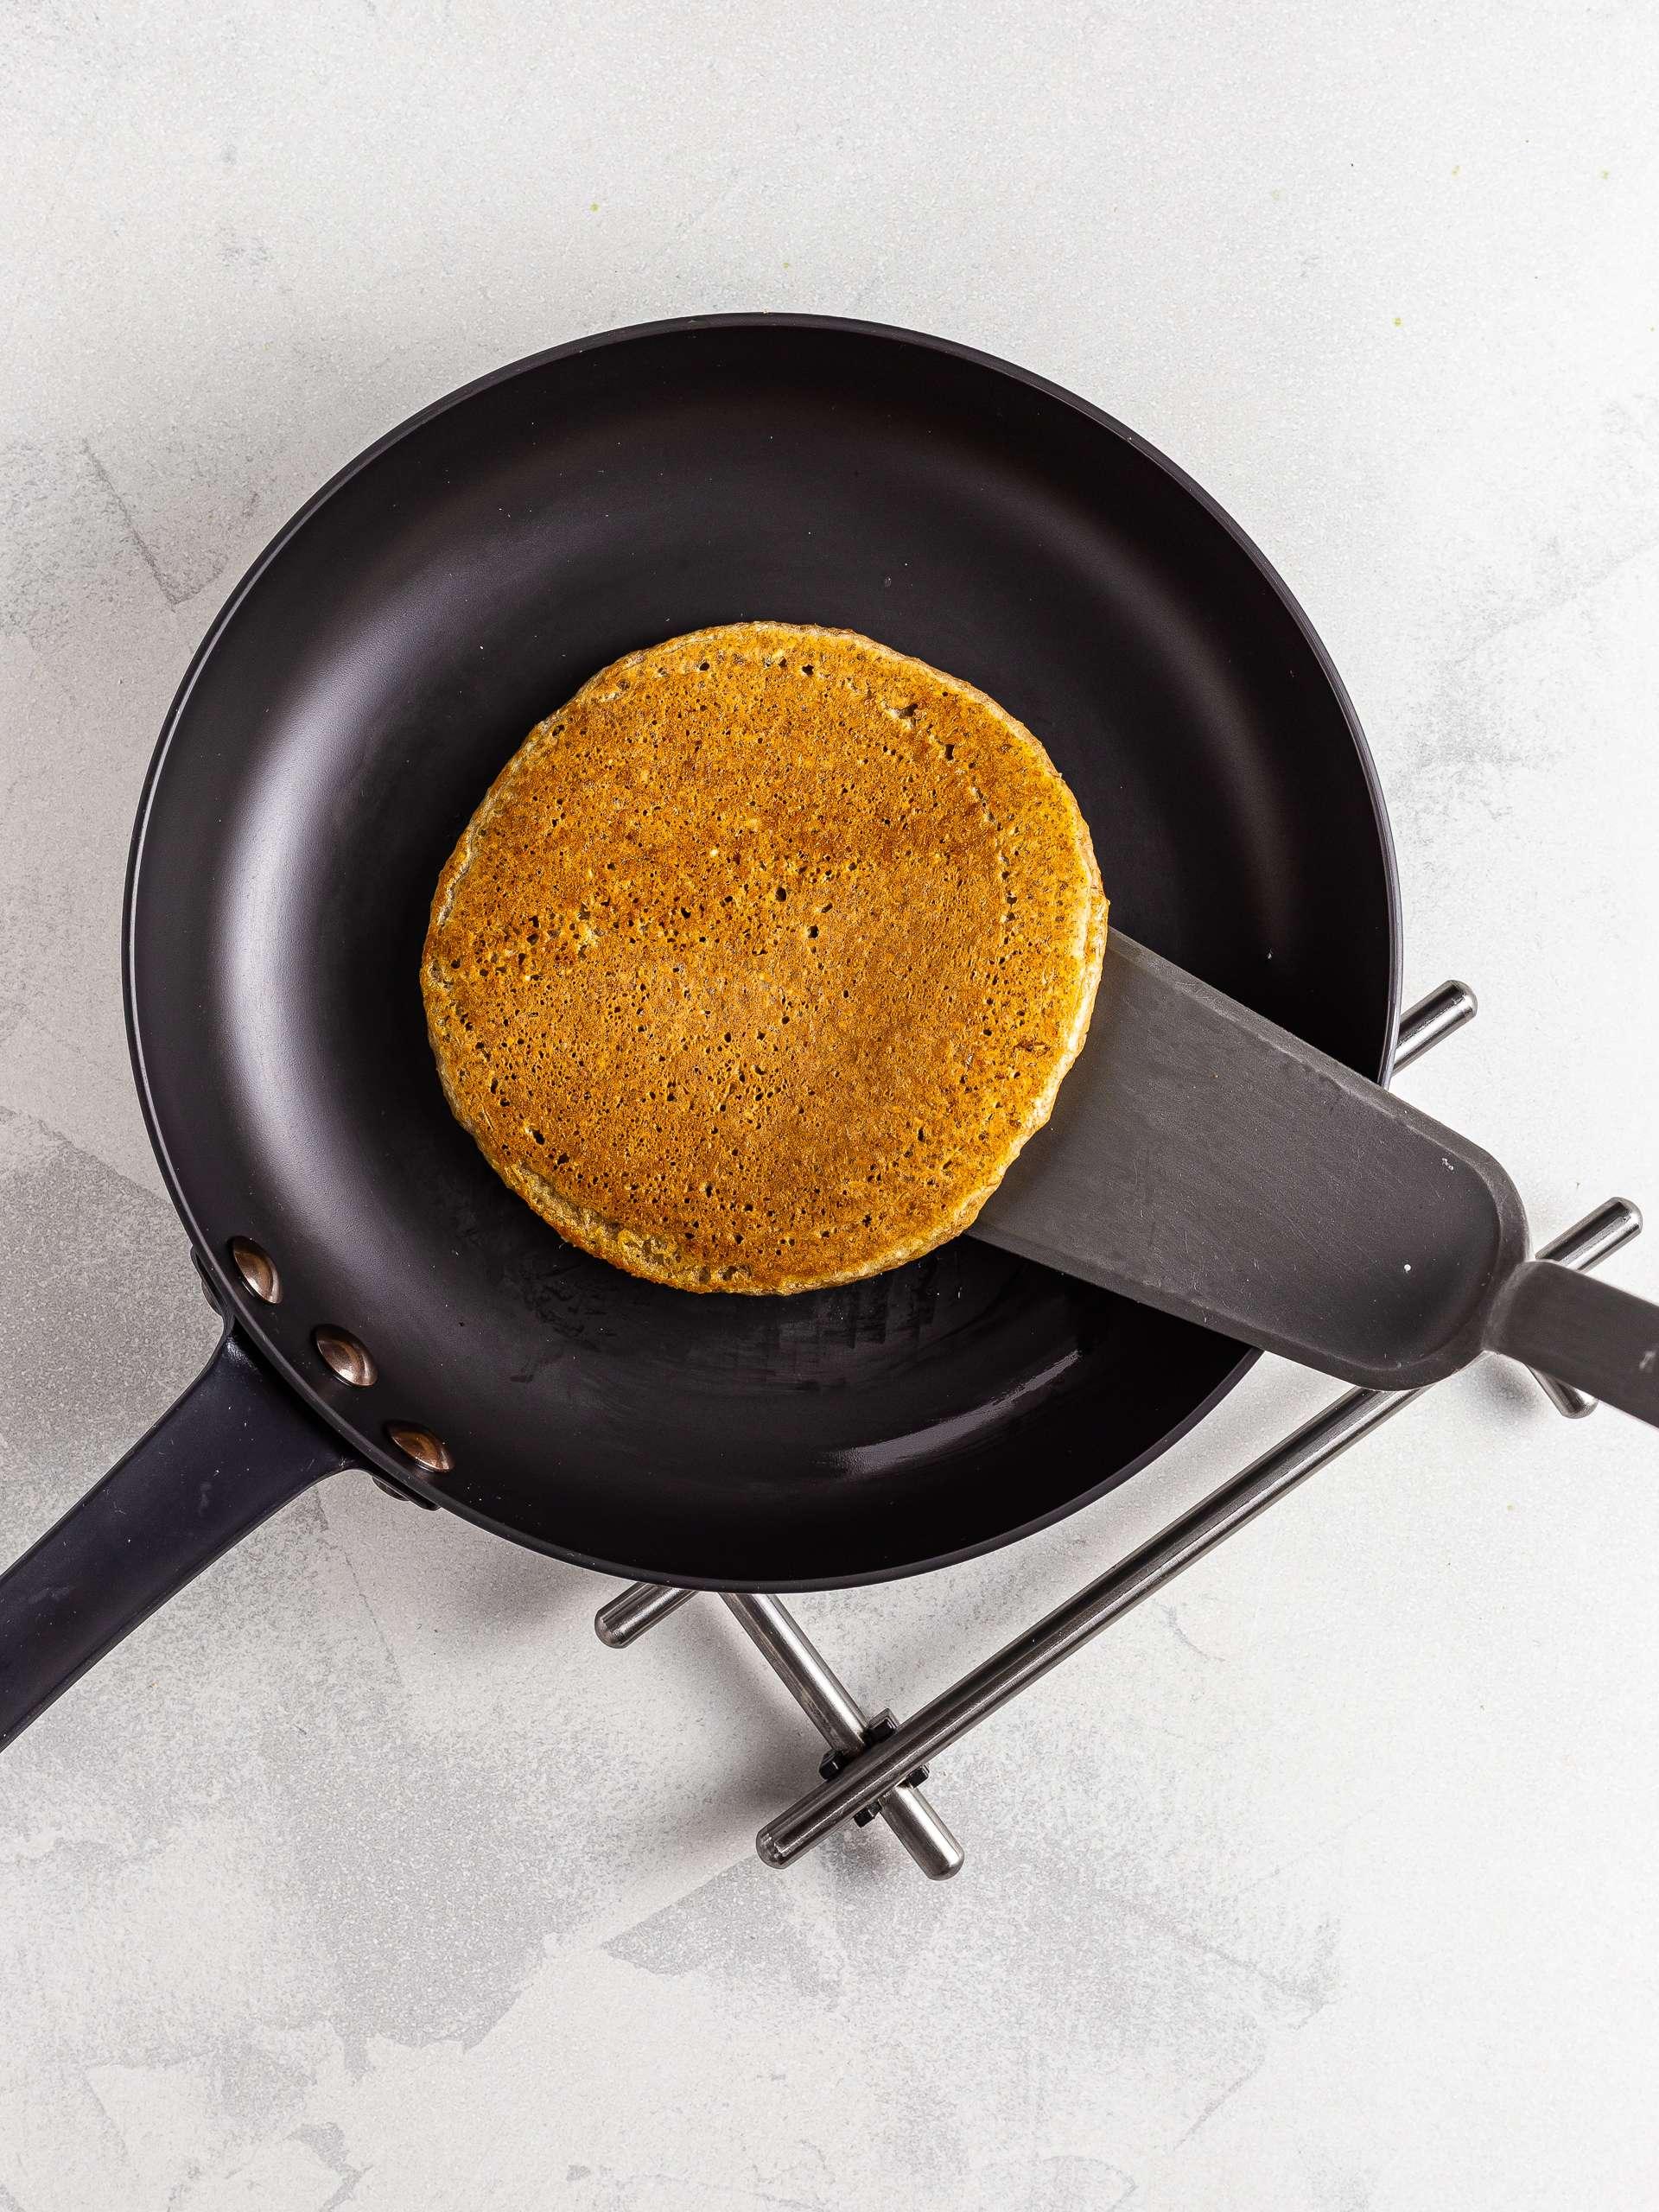 Flipped lentil pancakes in a skillet